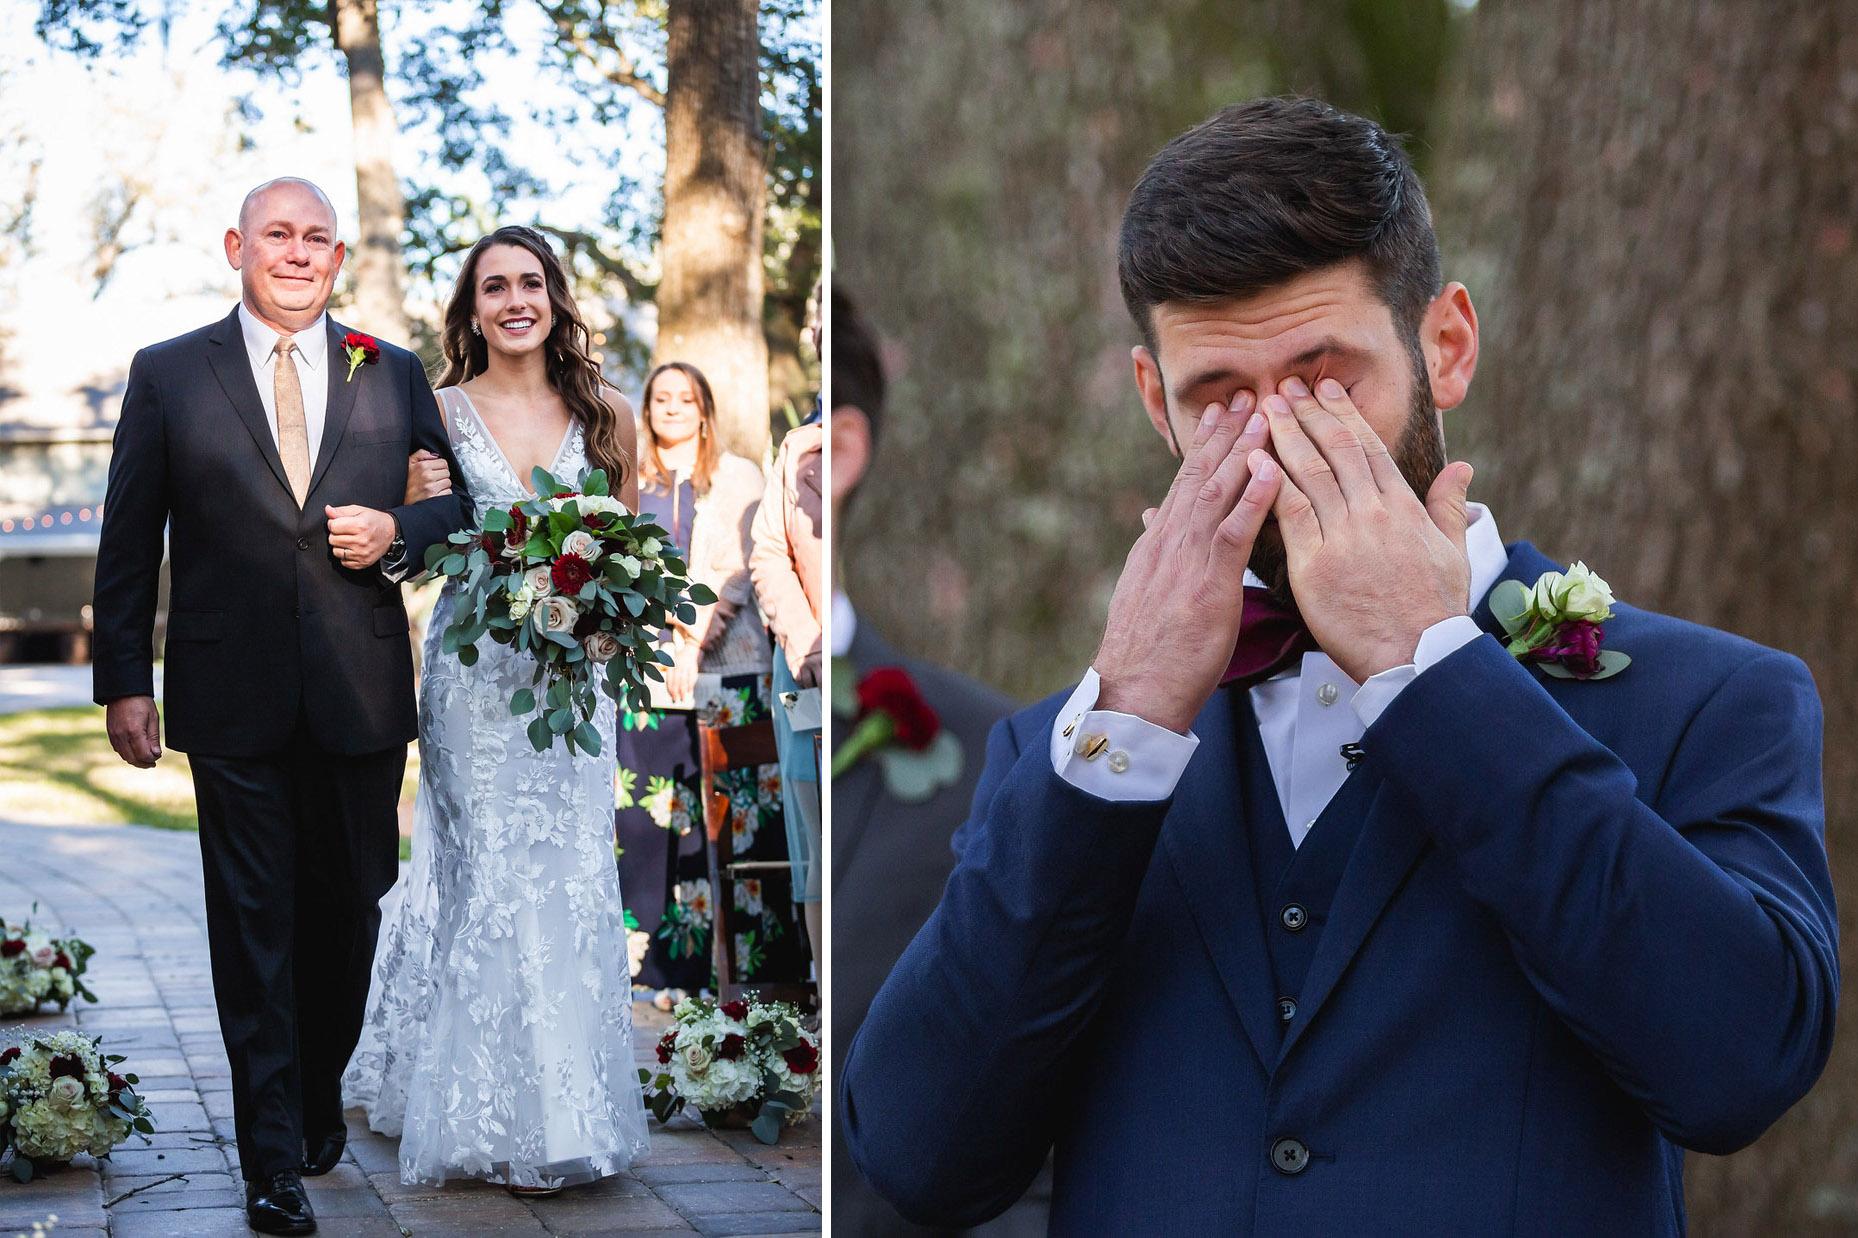 adam-szarmack-bowing-oaks-wedding-photographer-jacksonville-73.jpg